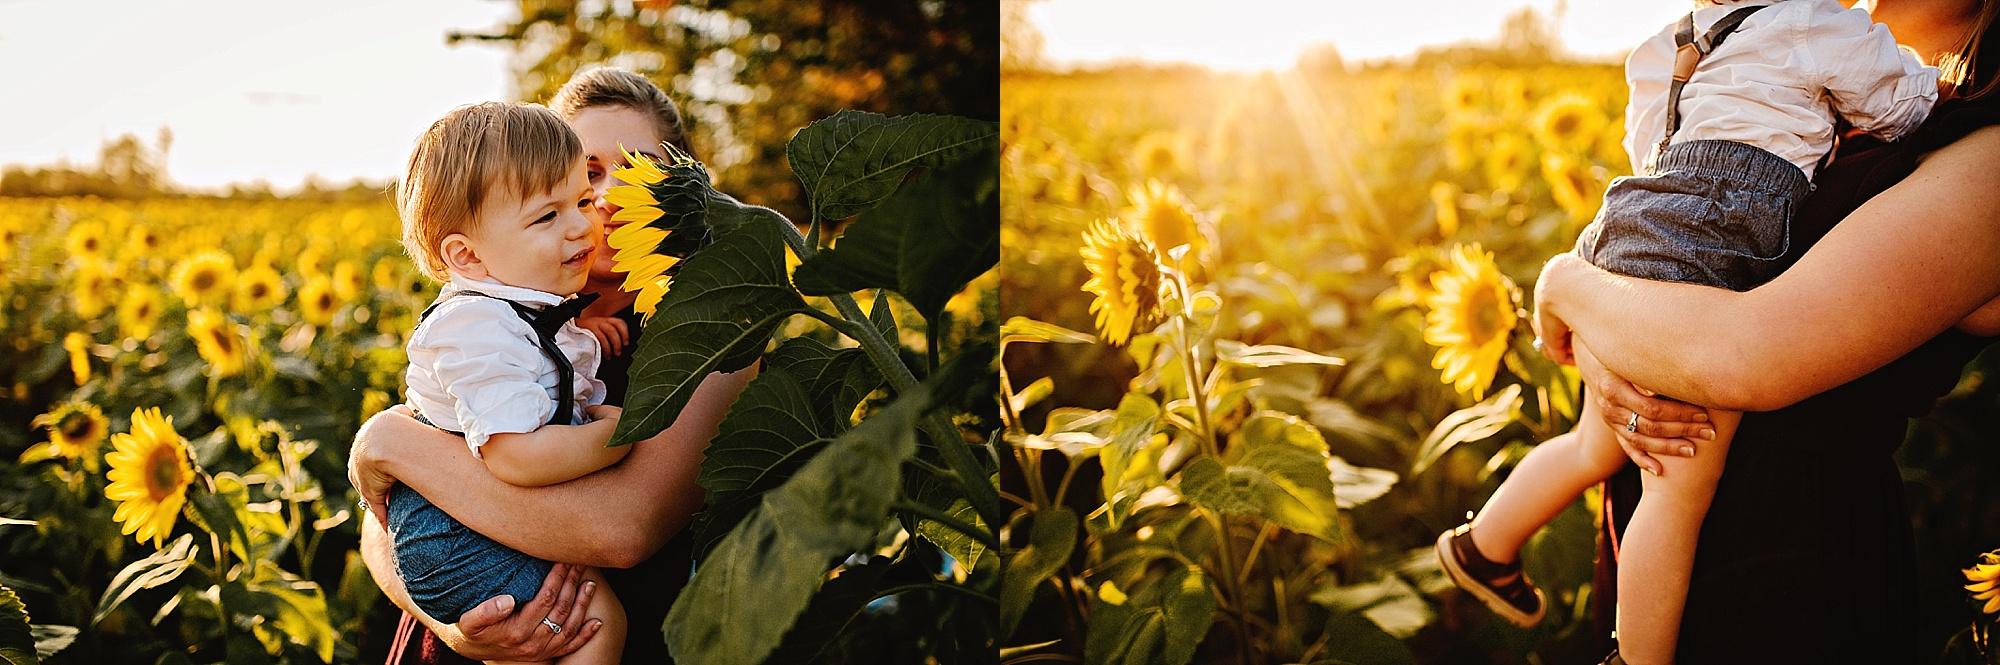 Schreiner-family-lauren-grayson-cleveland-photographer-sunflower-field-session_0021.jpg